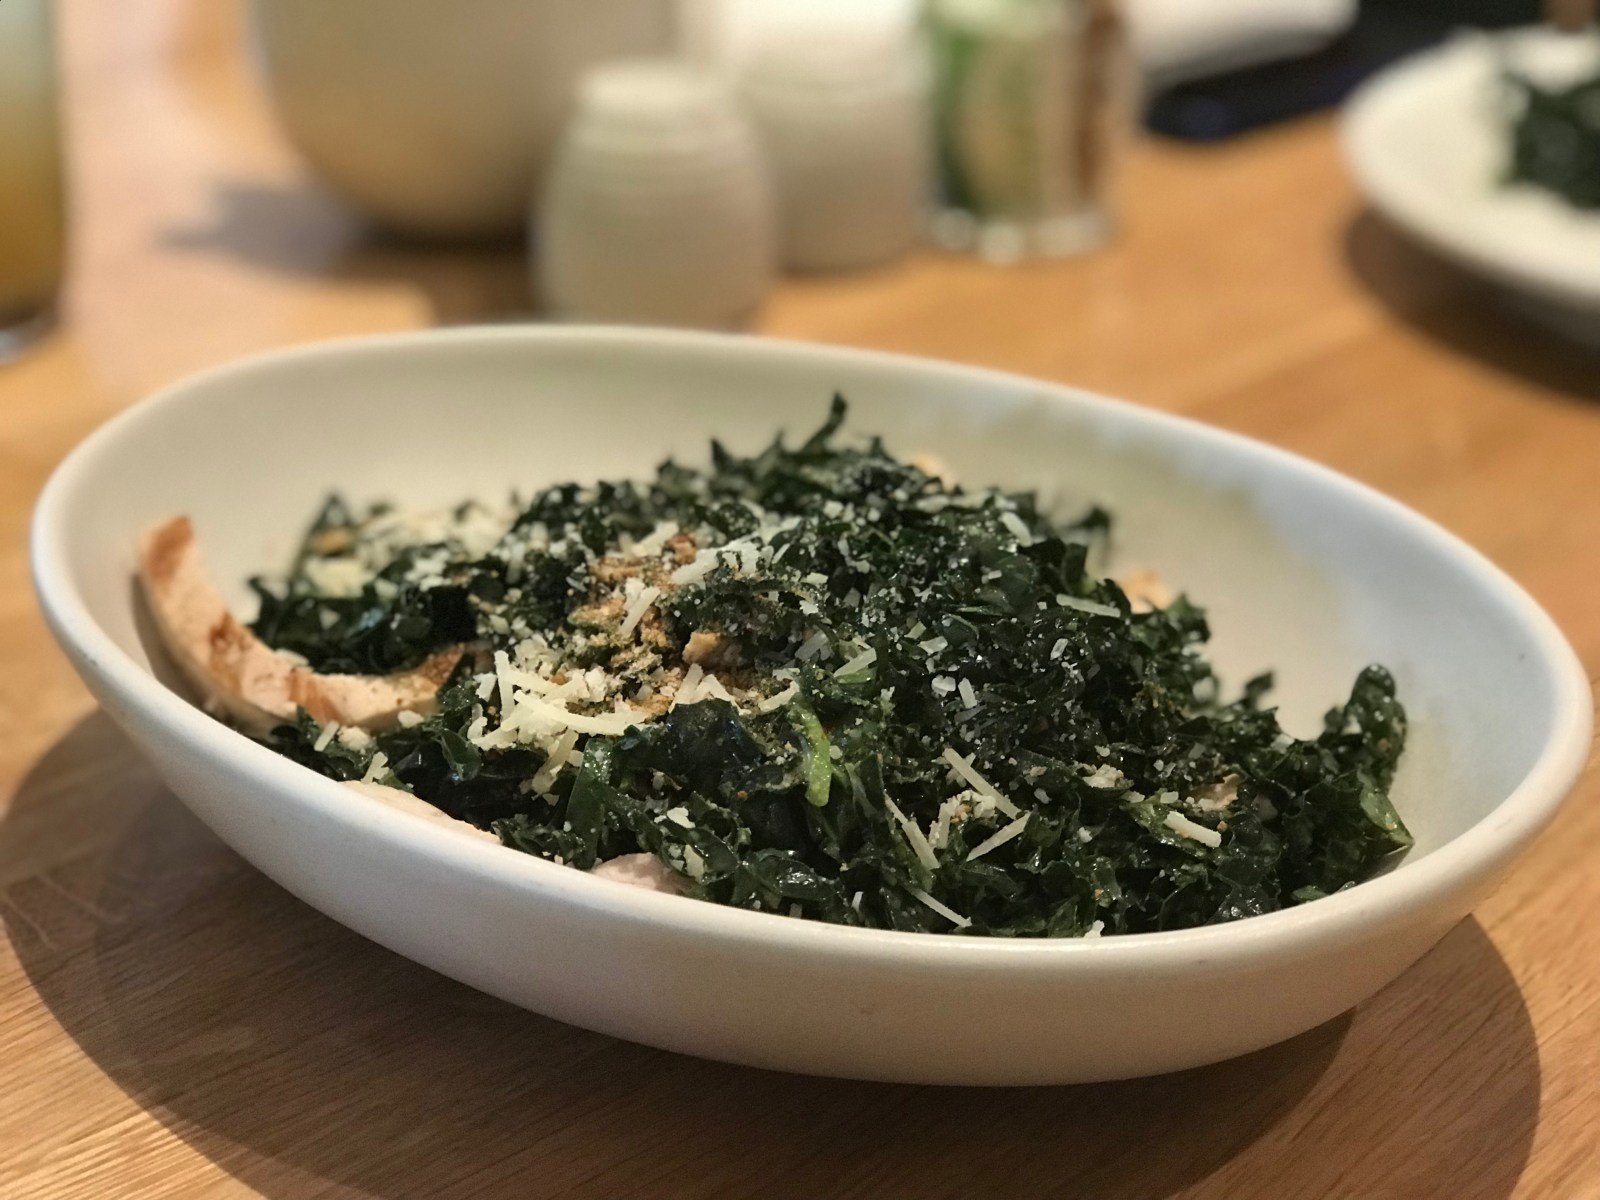 Chicago Apartments, True Food Kitchen, Kale Salad